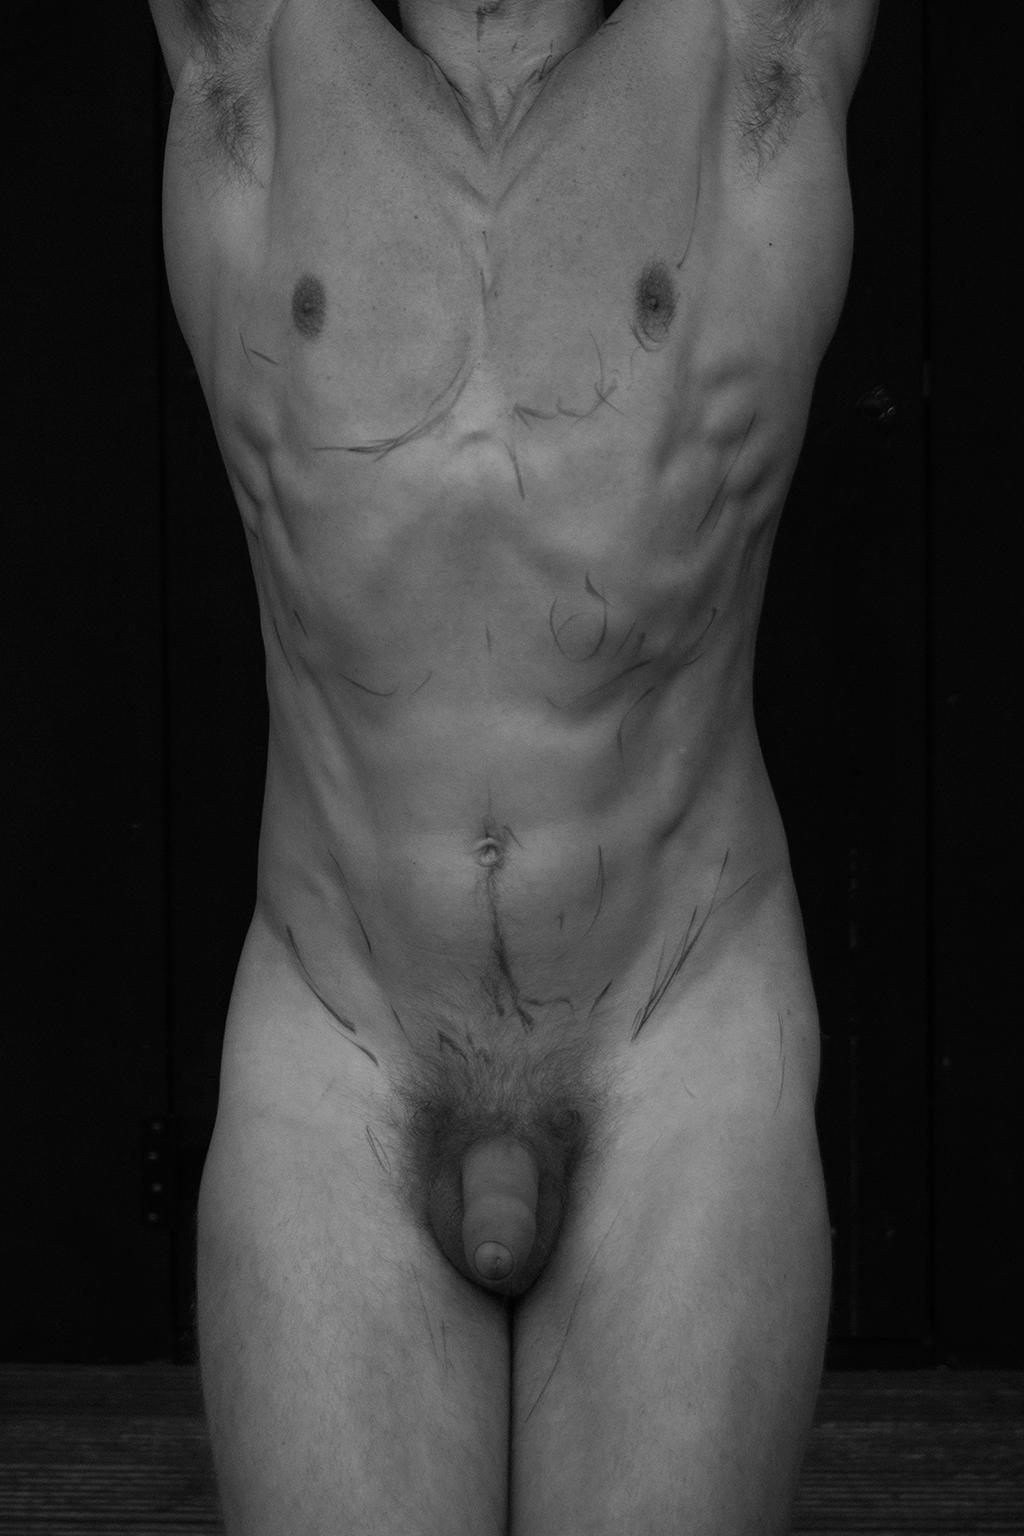 Body,  Archival pigment print Medium Black and white Photograph